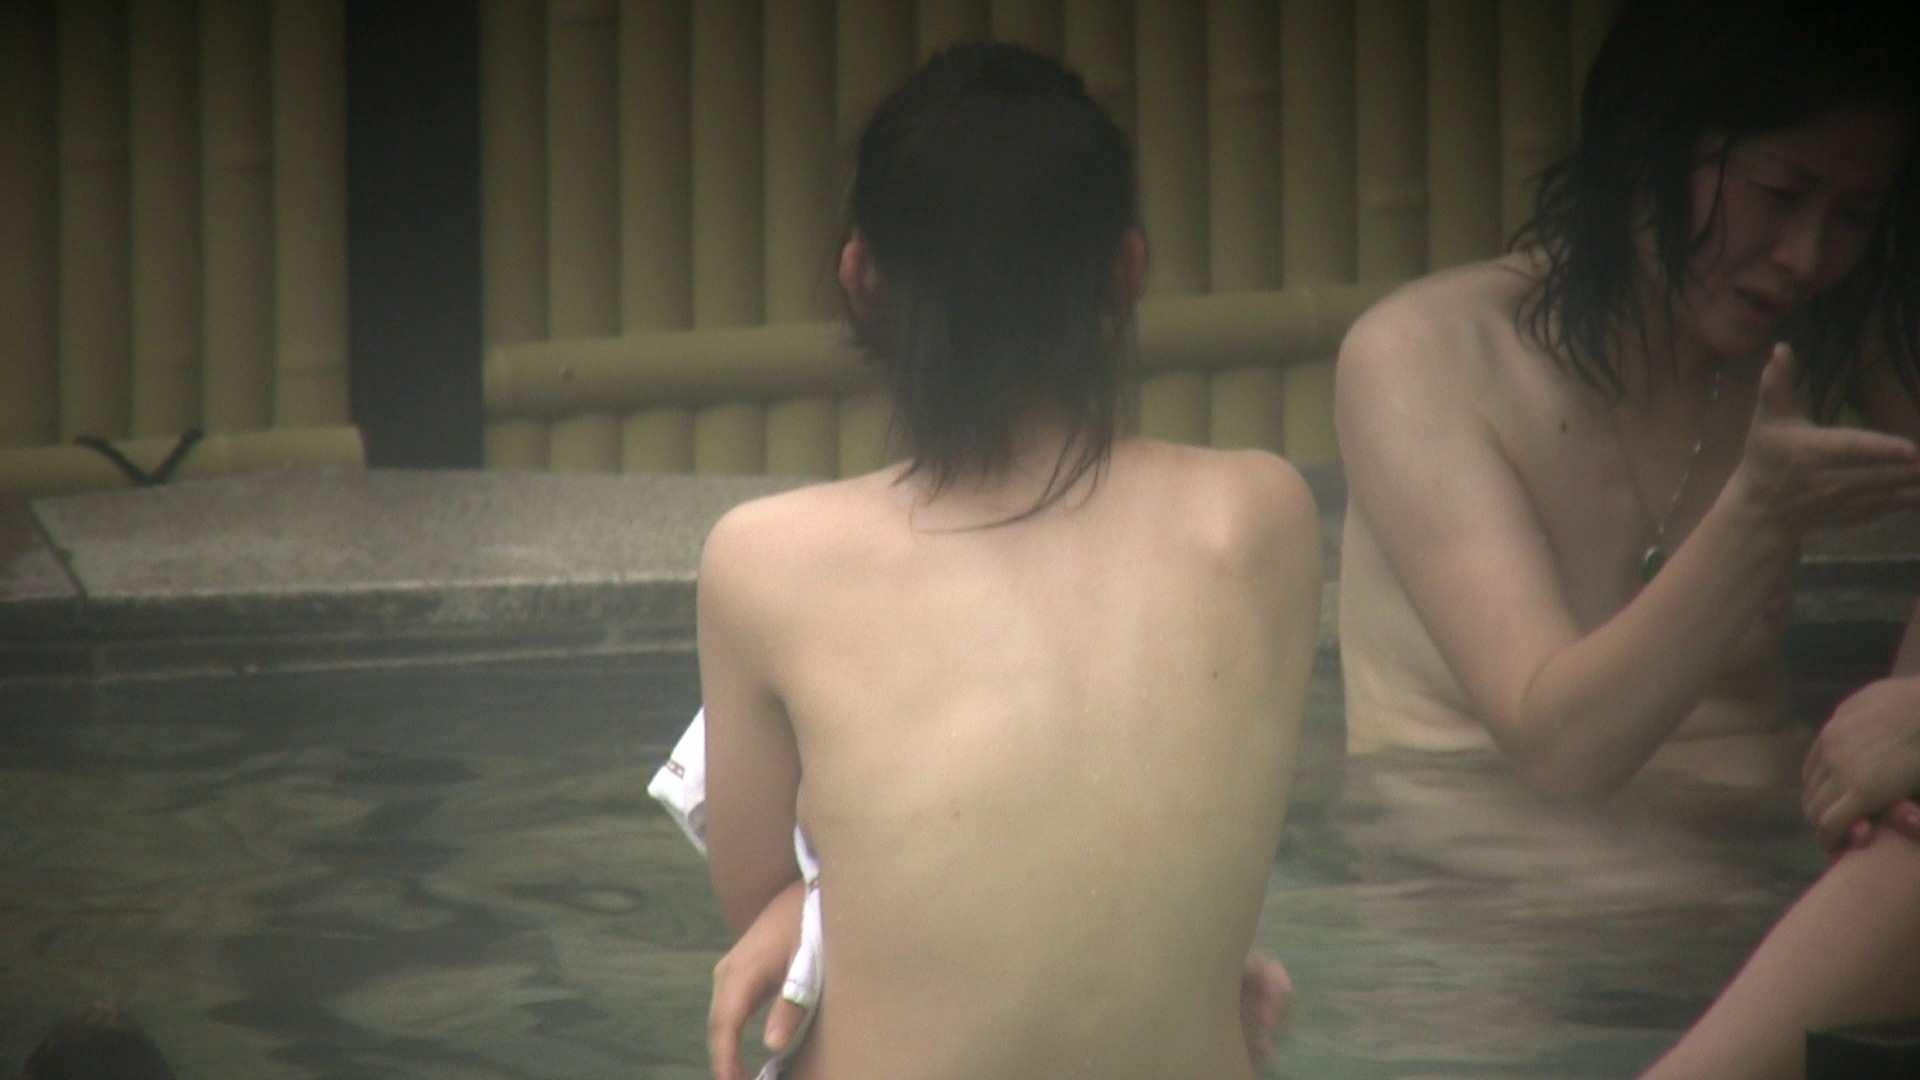 Aquaな露天風呂Vol.138 露天風呂突入   美しいOLの裸体  92pic 79